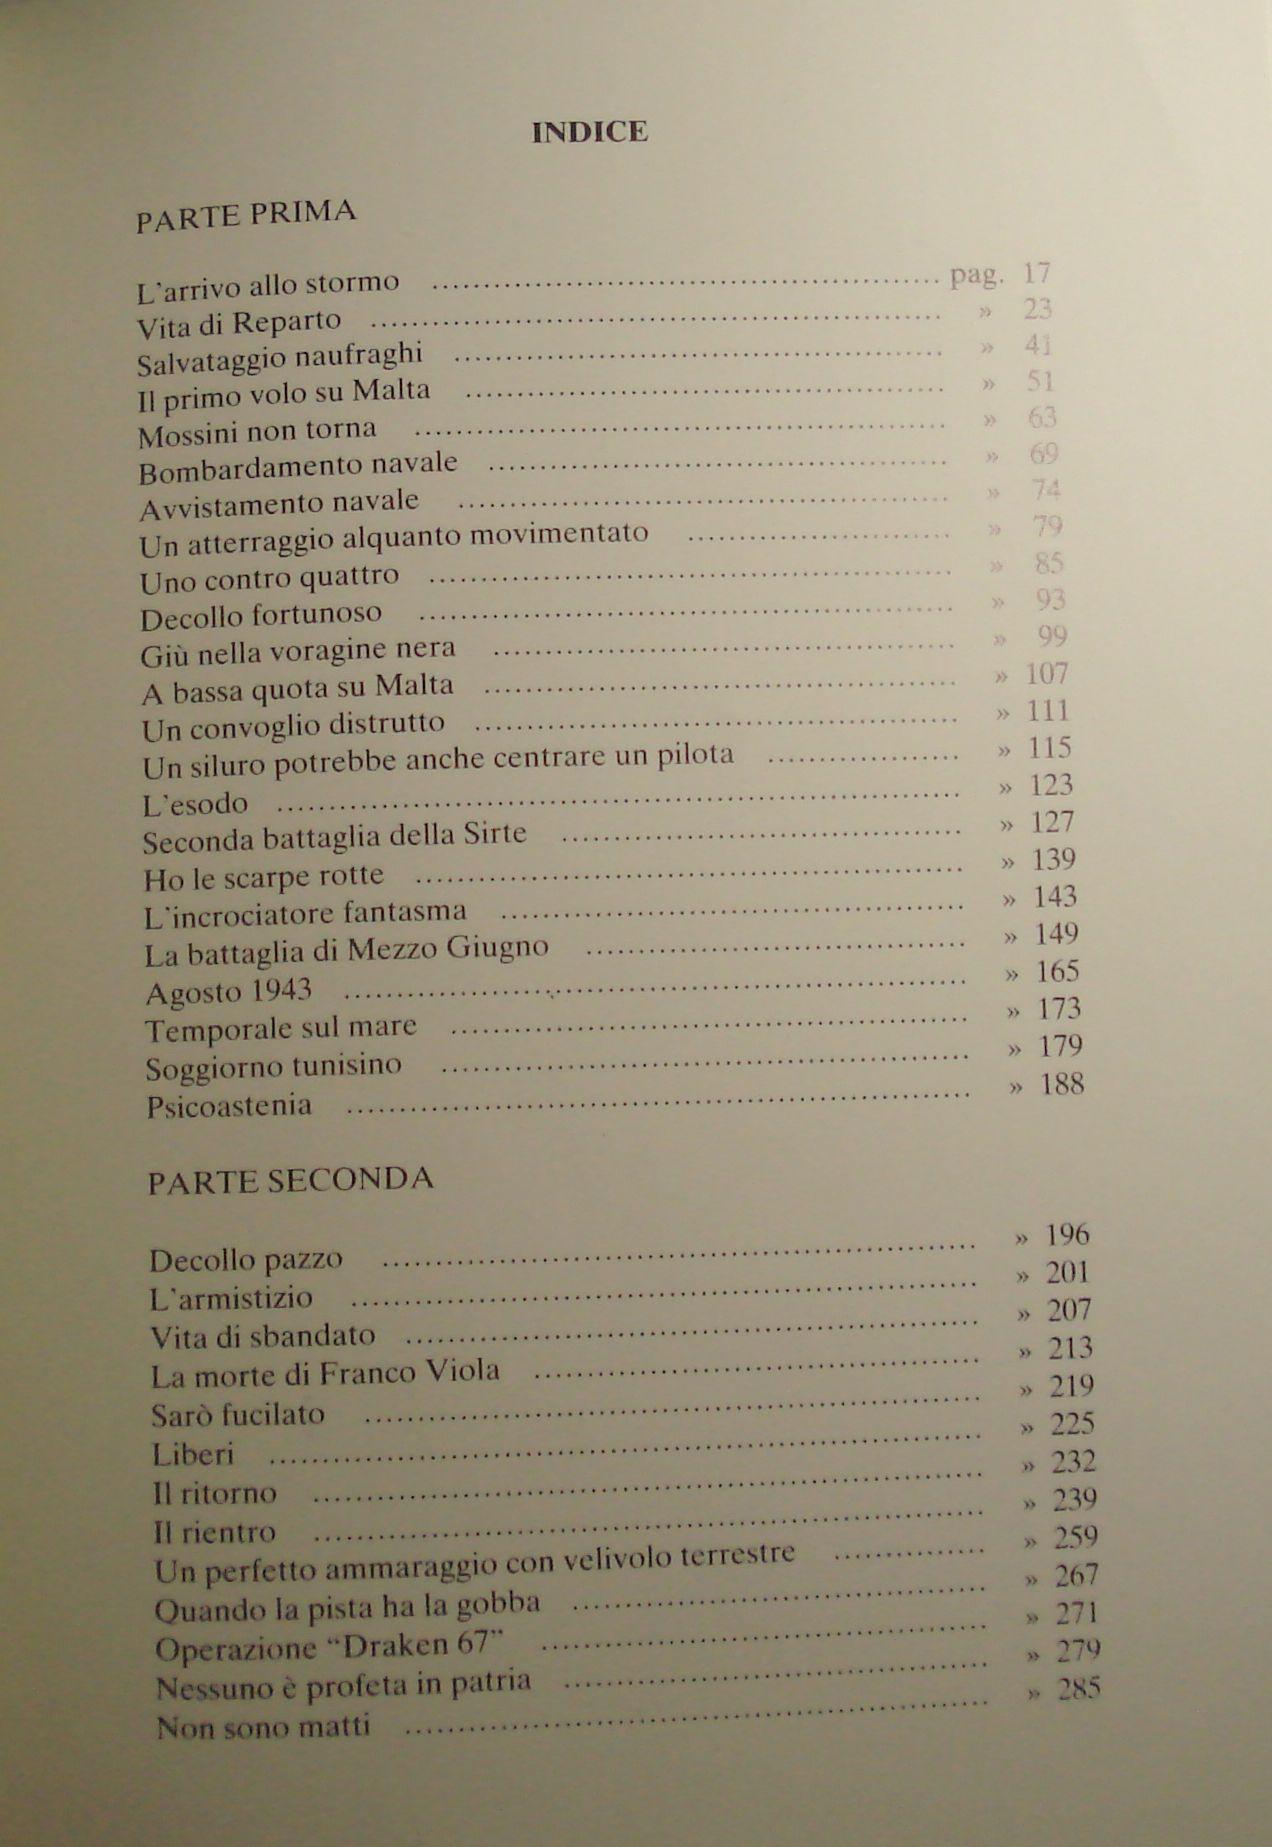 UN PILOTA RACCONTA (MEMORIE UFFICIALE REGIA AERONAUTICA SECONDA GUERRA MONDIALE)